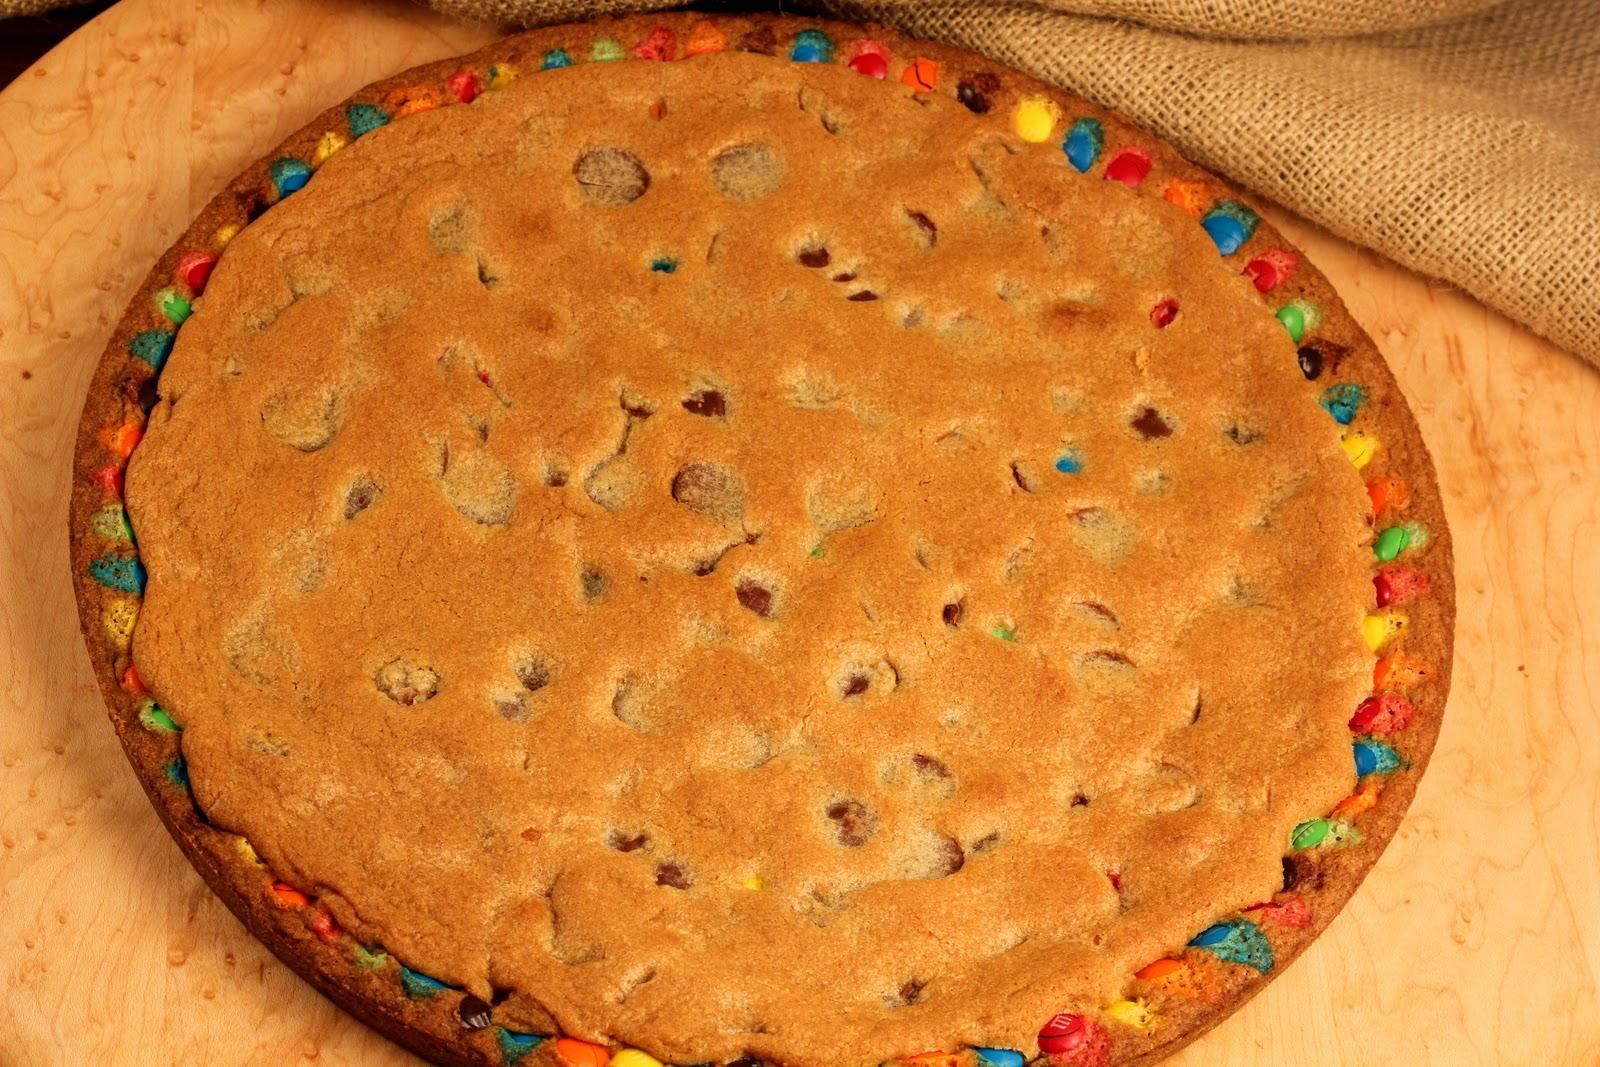 Emeril Lagasse Chocolate Chip Cookie Cake